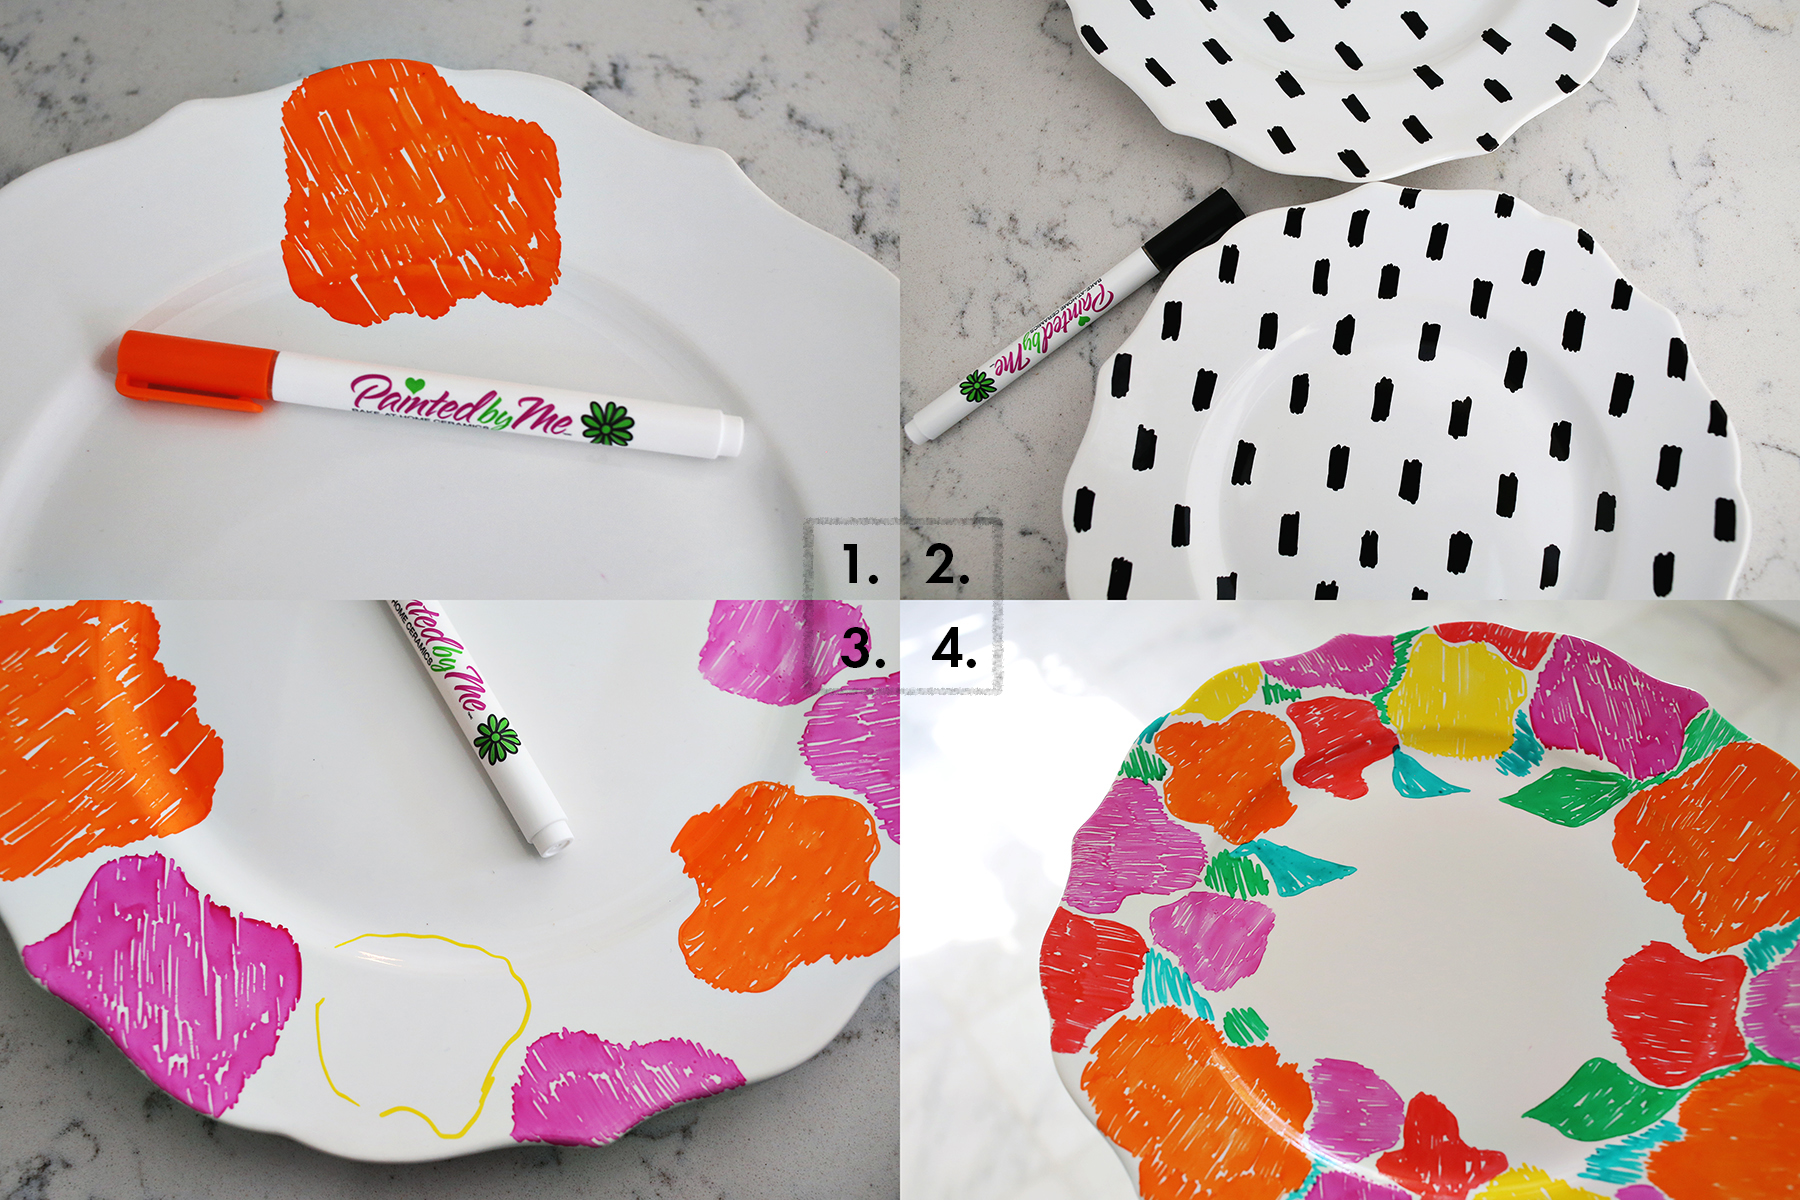 Hand Painted Dish Set - A Beautiful Mess